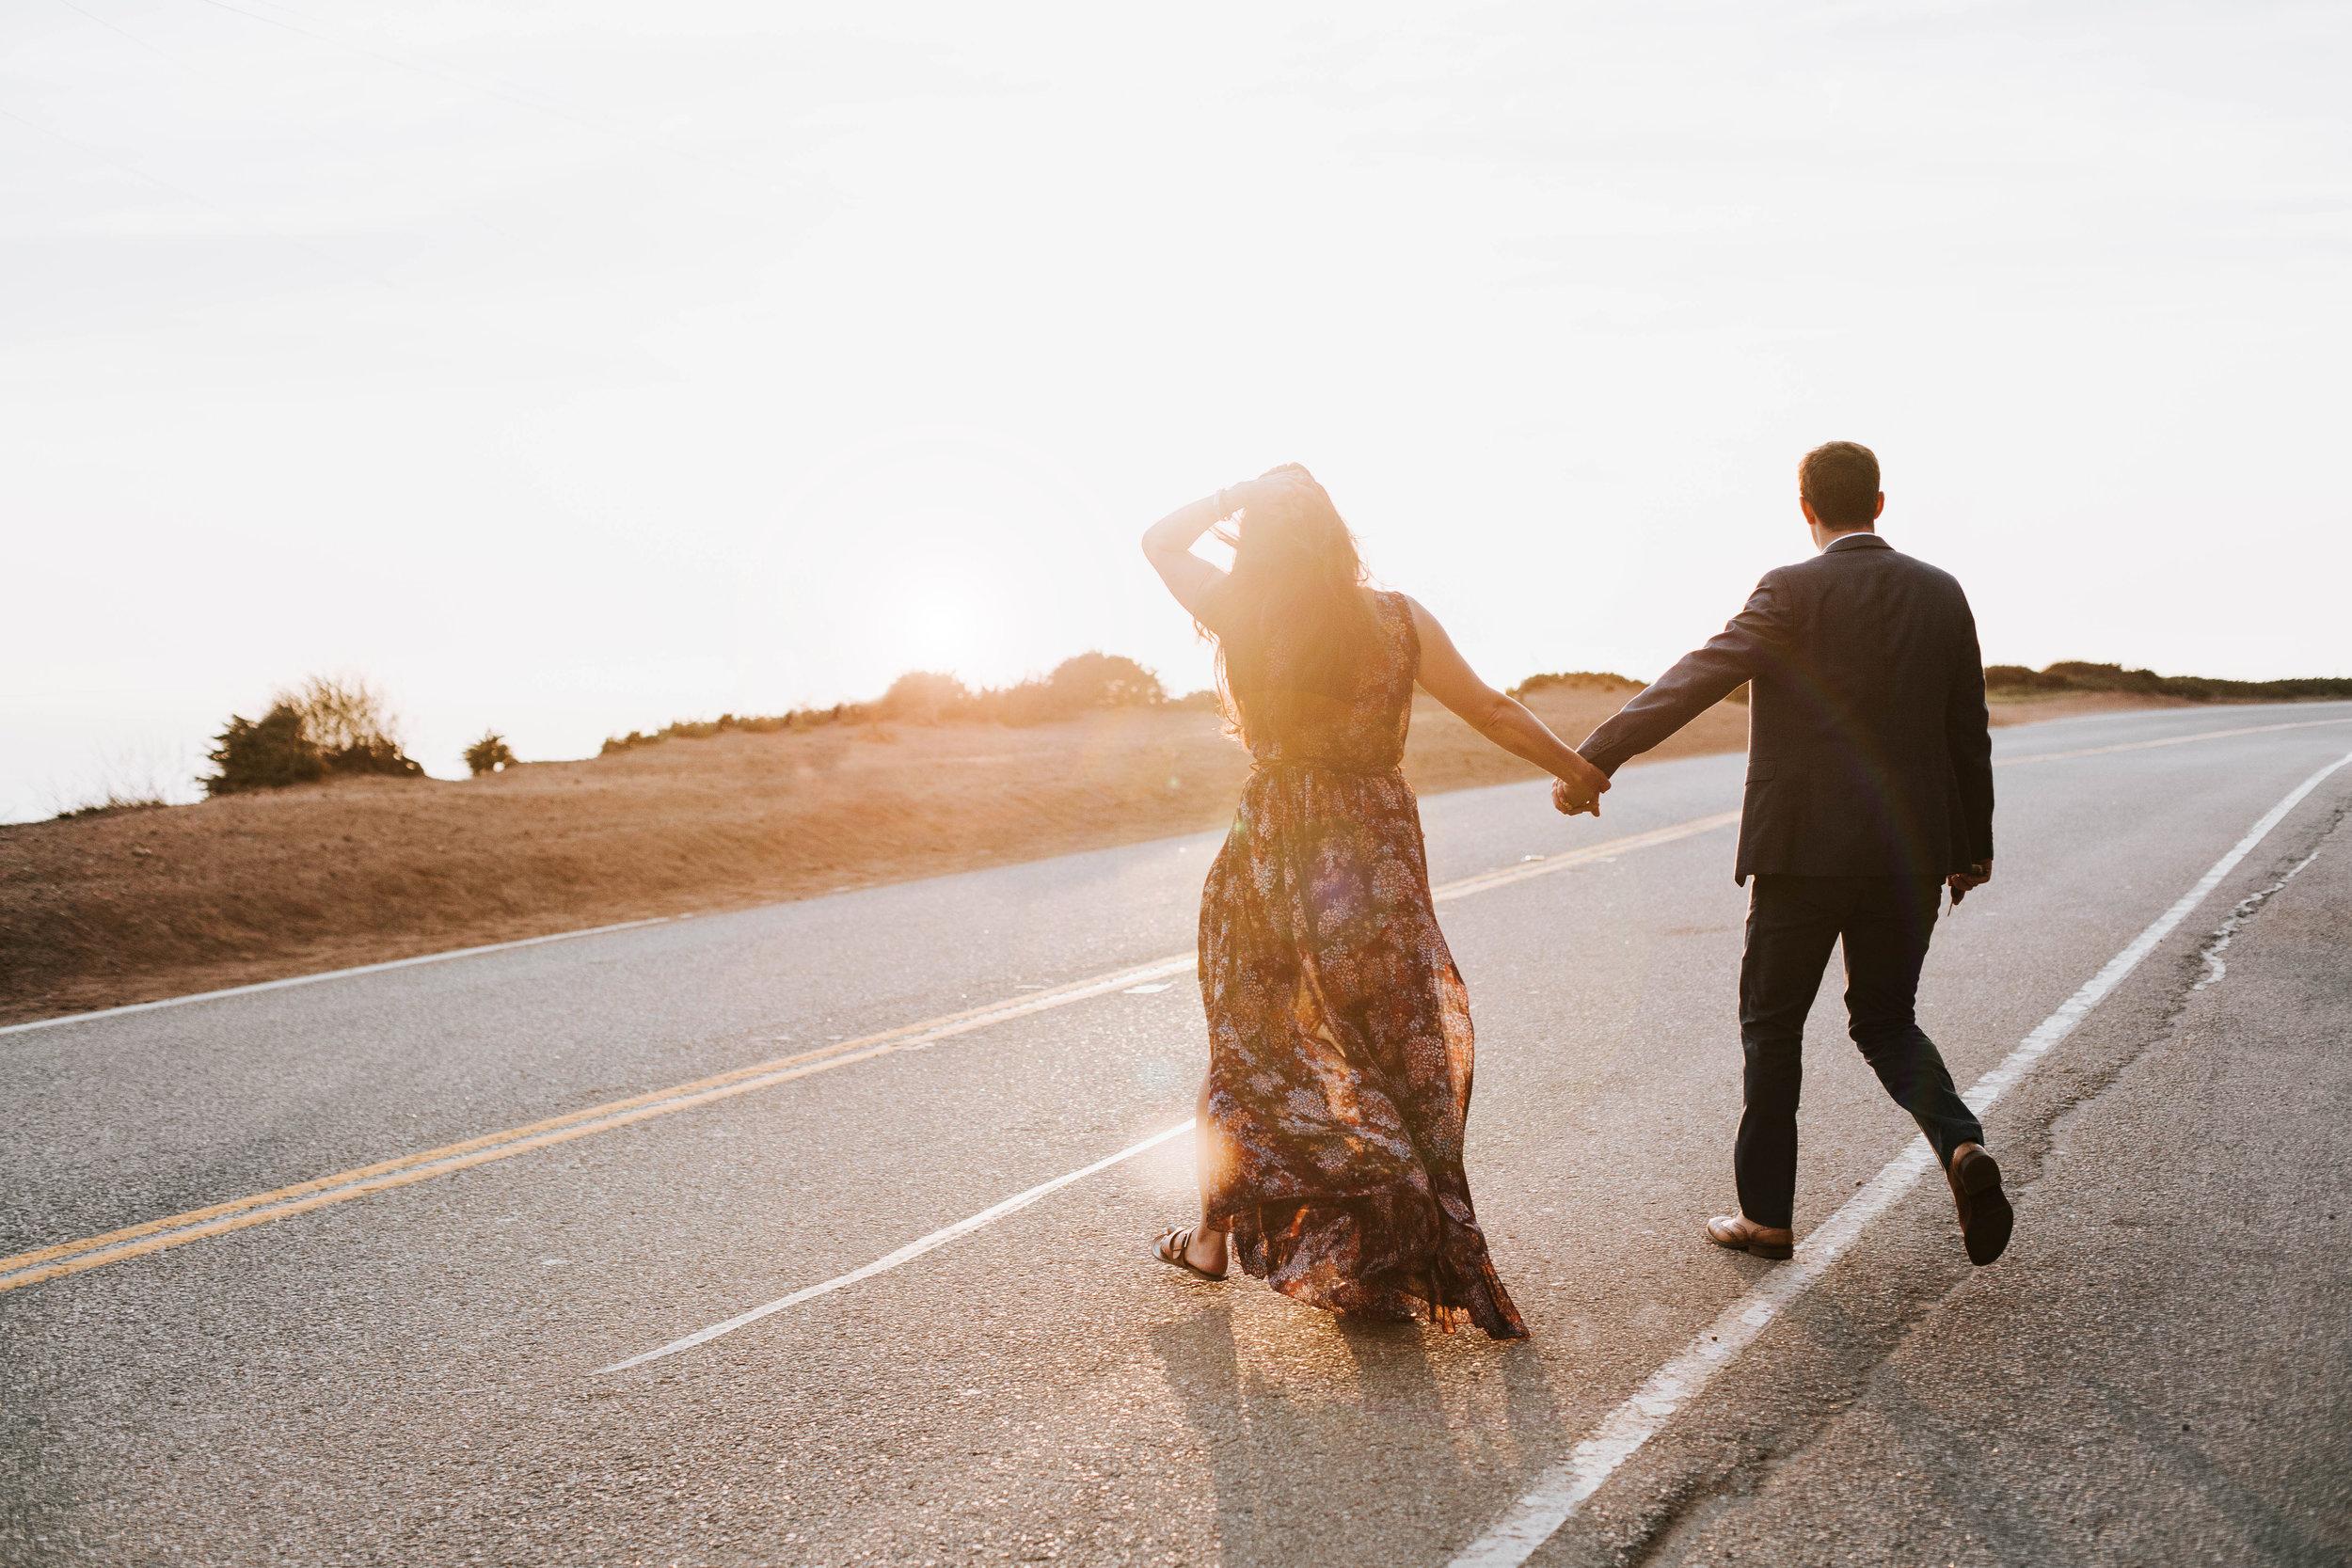 nicole-daacke-photography-big-sur-california-coast-adventure-engagement-photos-adventurous-elopement-intimate-wedding-photographer-golden-coastal-cali-engagement-session-23.jpg